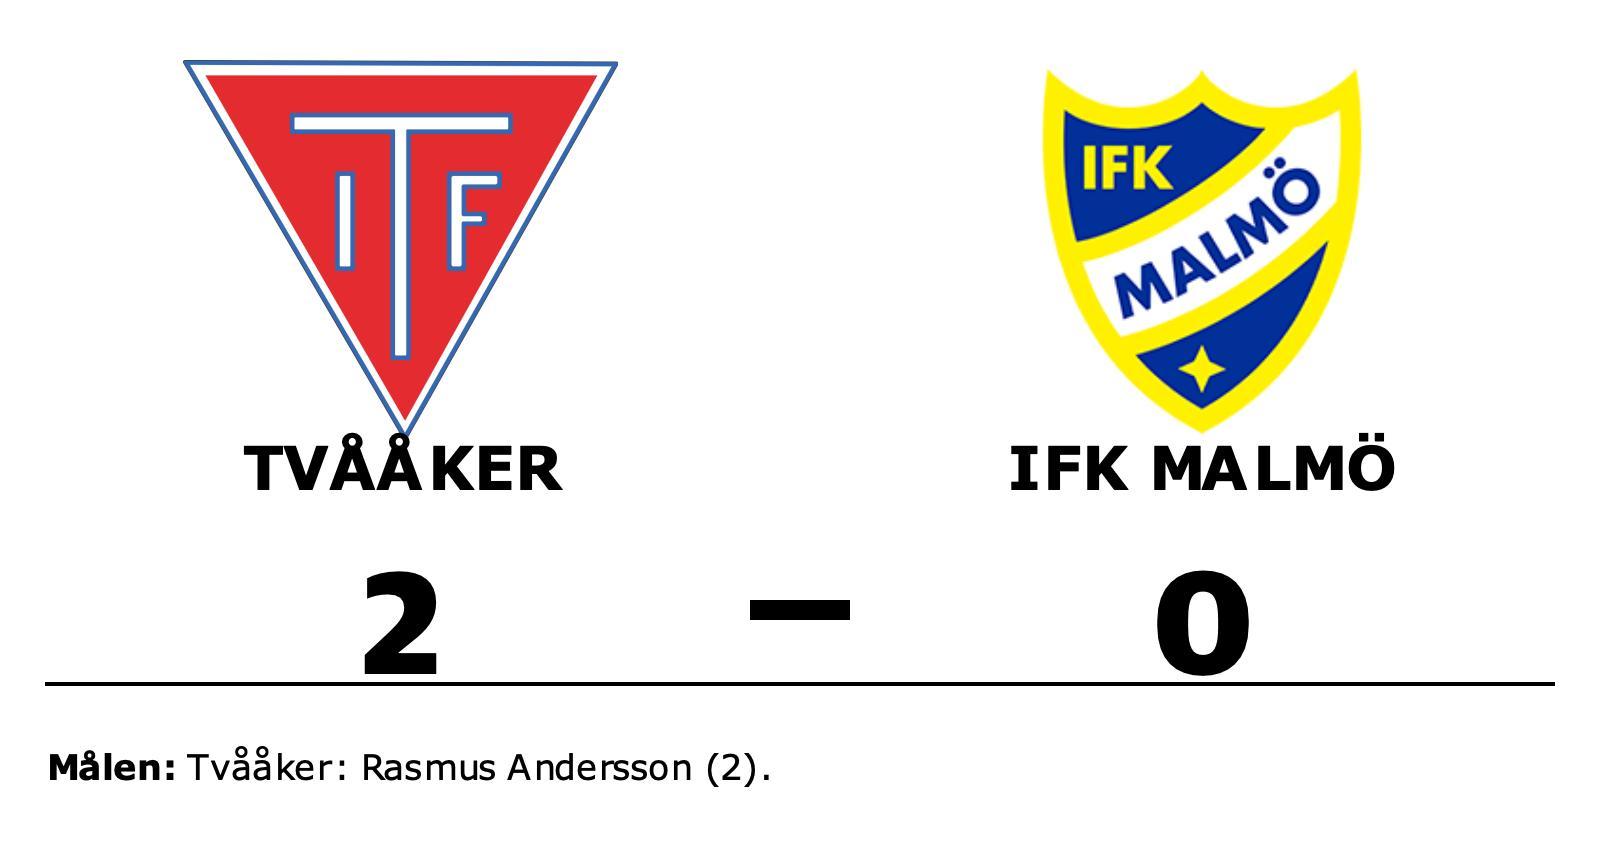 Tvååkers Rasmus Andersson sänkte IFK Malmö